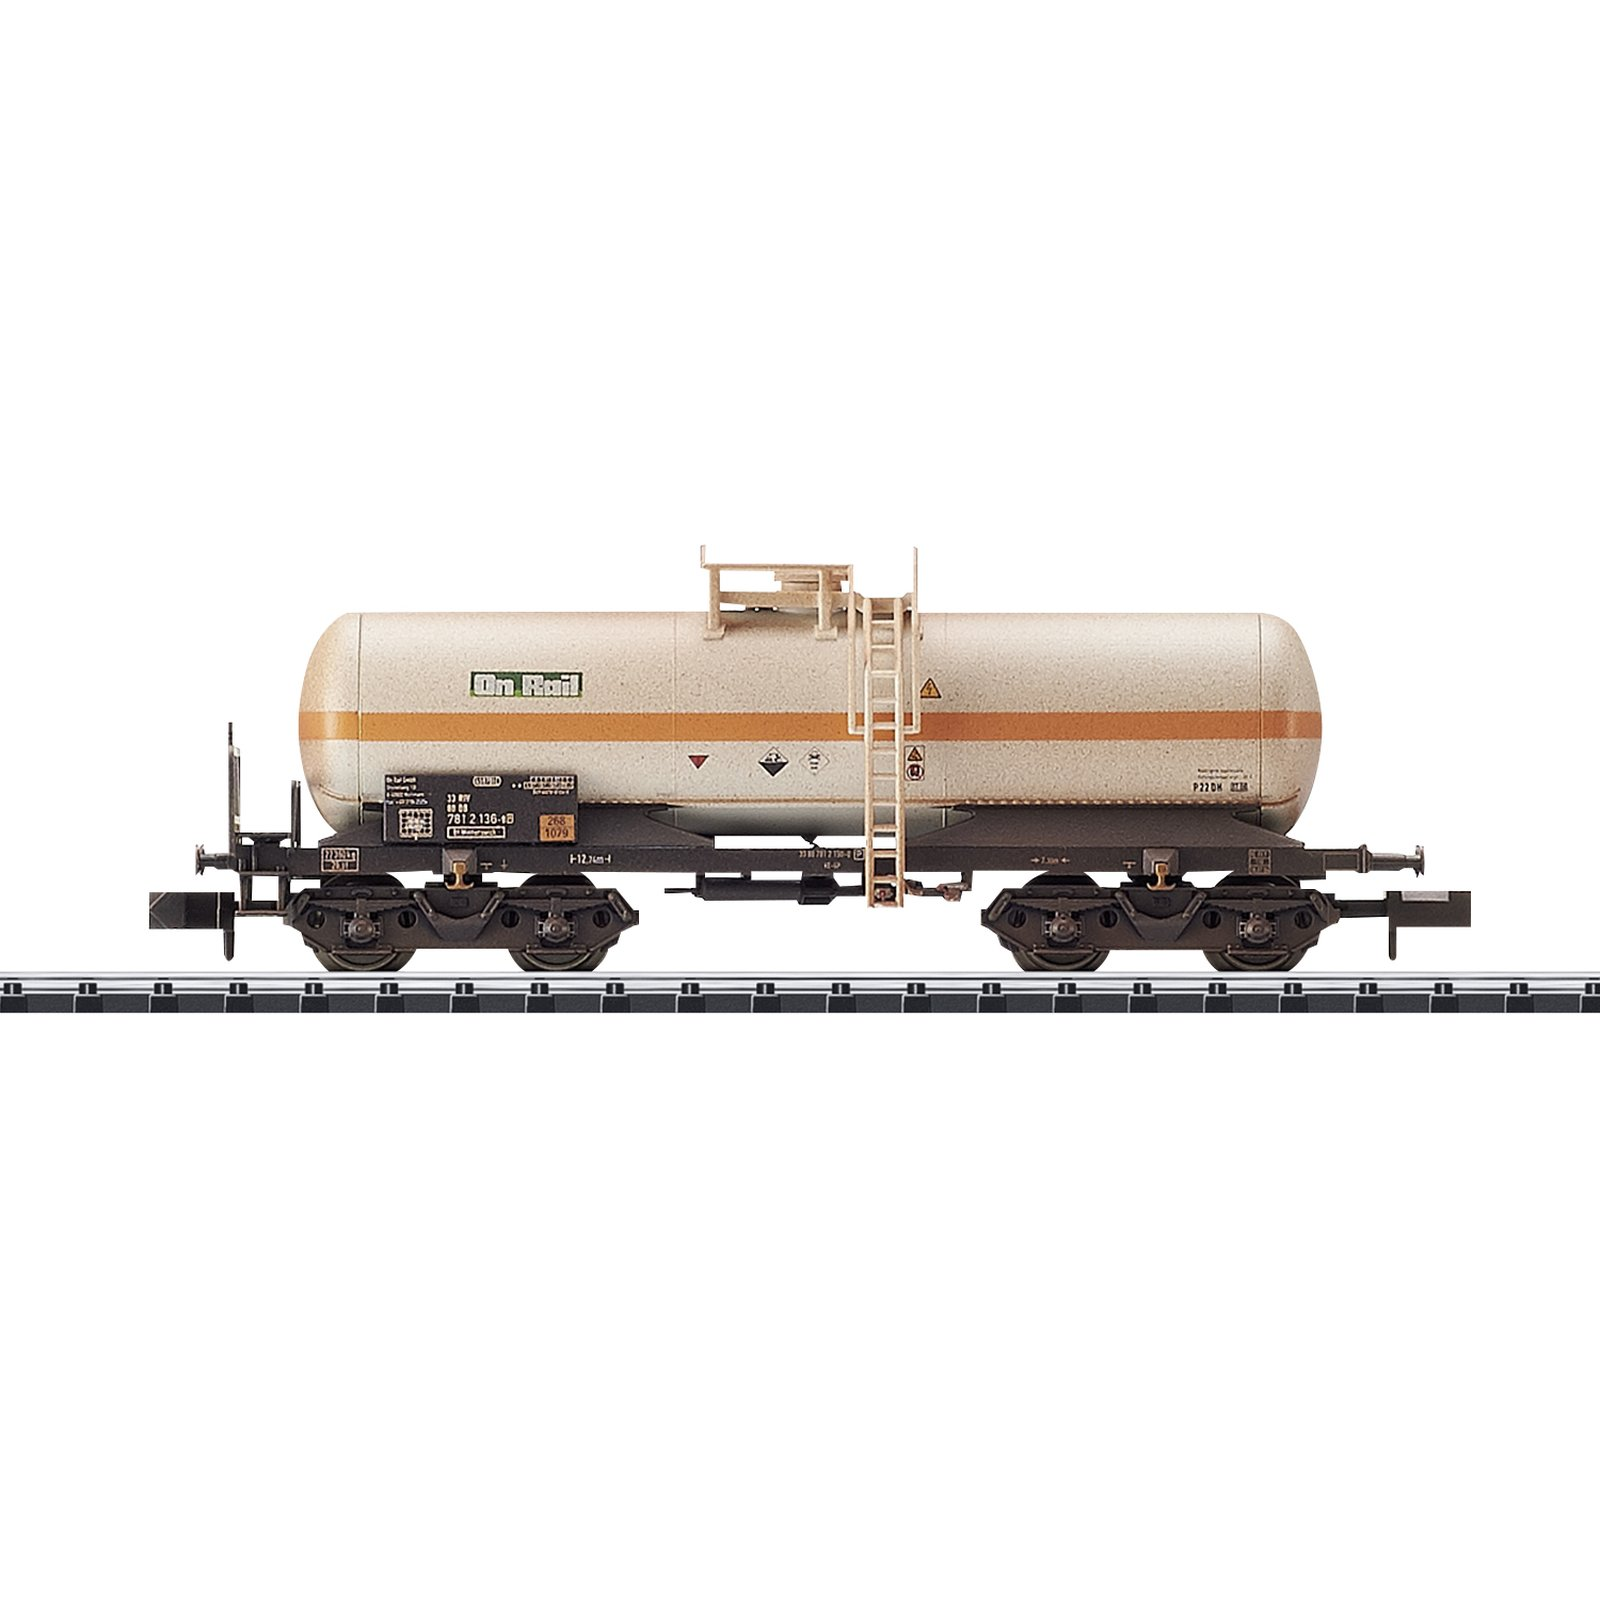 4 x Griffstange Hochbordwagen Güterwagen LGB 40210-E9018 Ersatzteile NEU